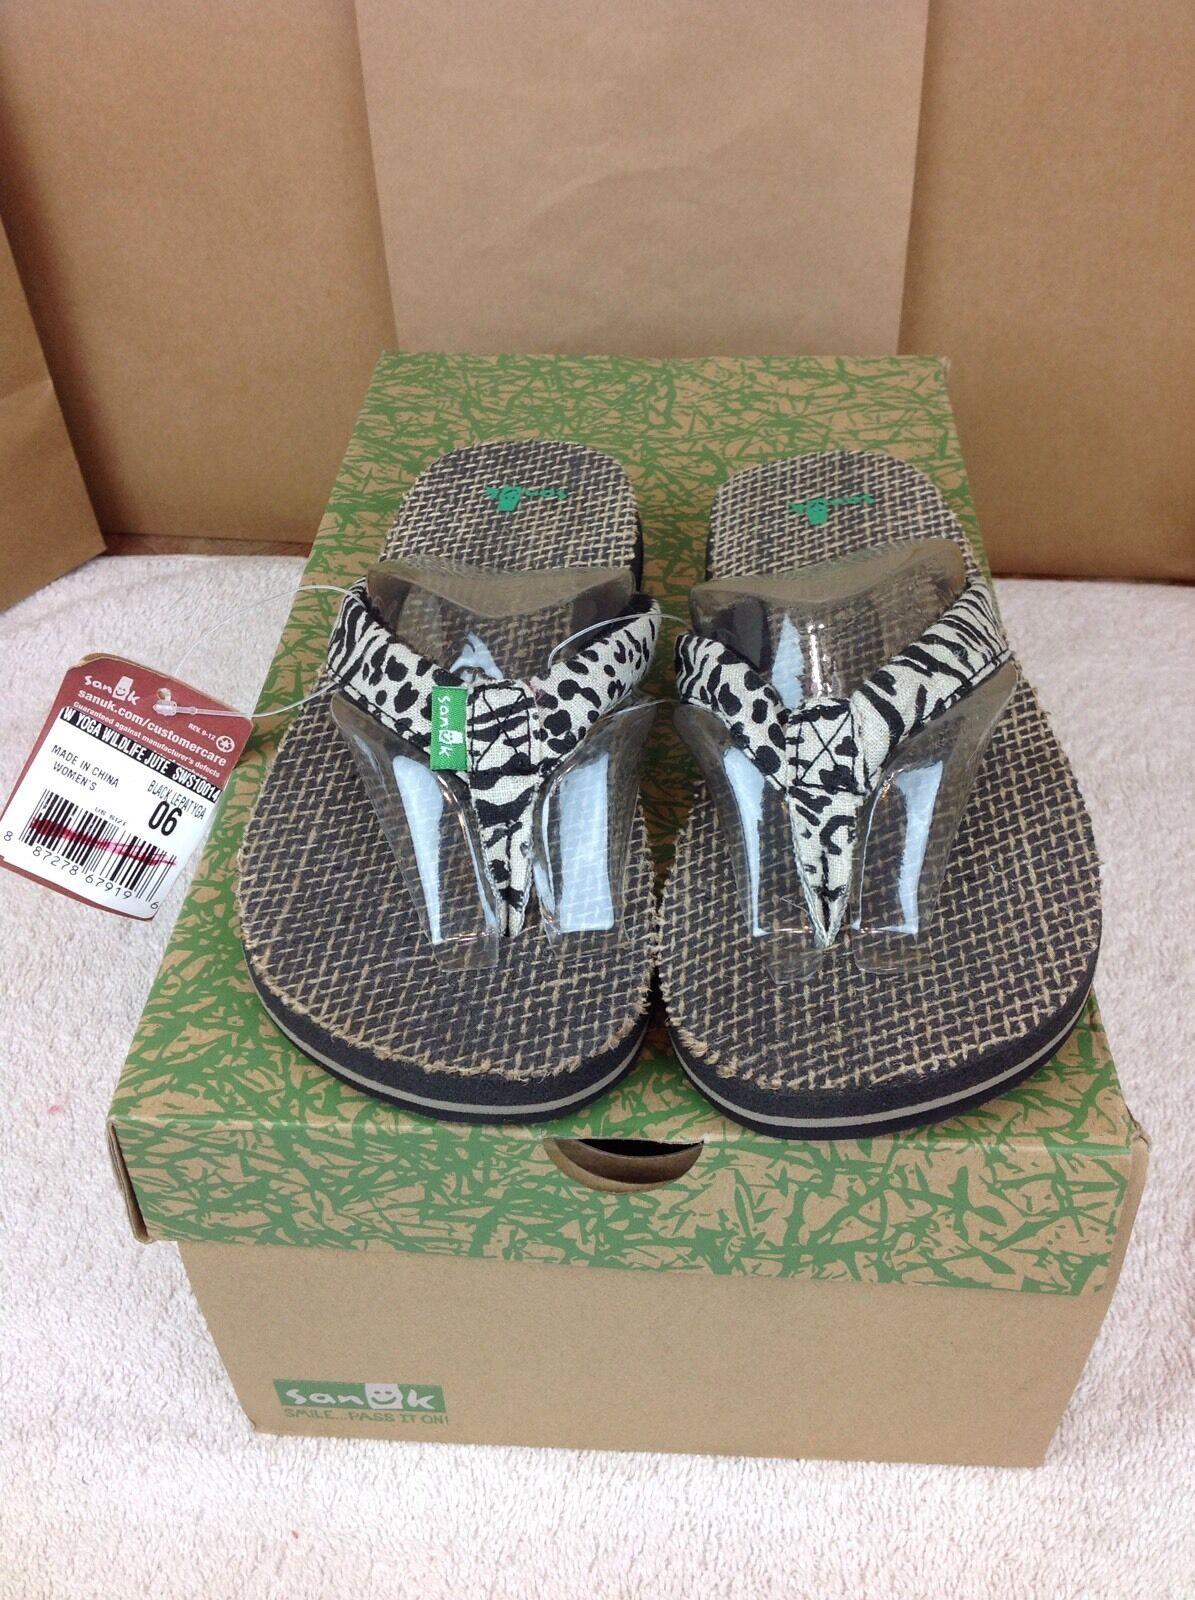 Sanuk Women's Yoga Wildlife Jute Lepatyga Sandals Flip Flops Size 6 US